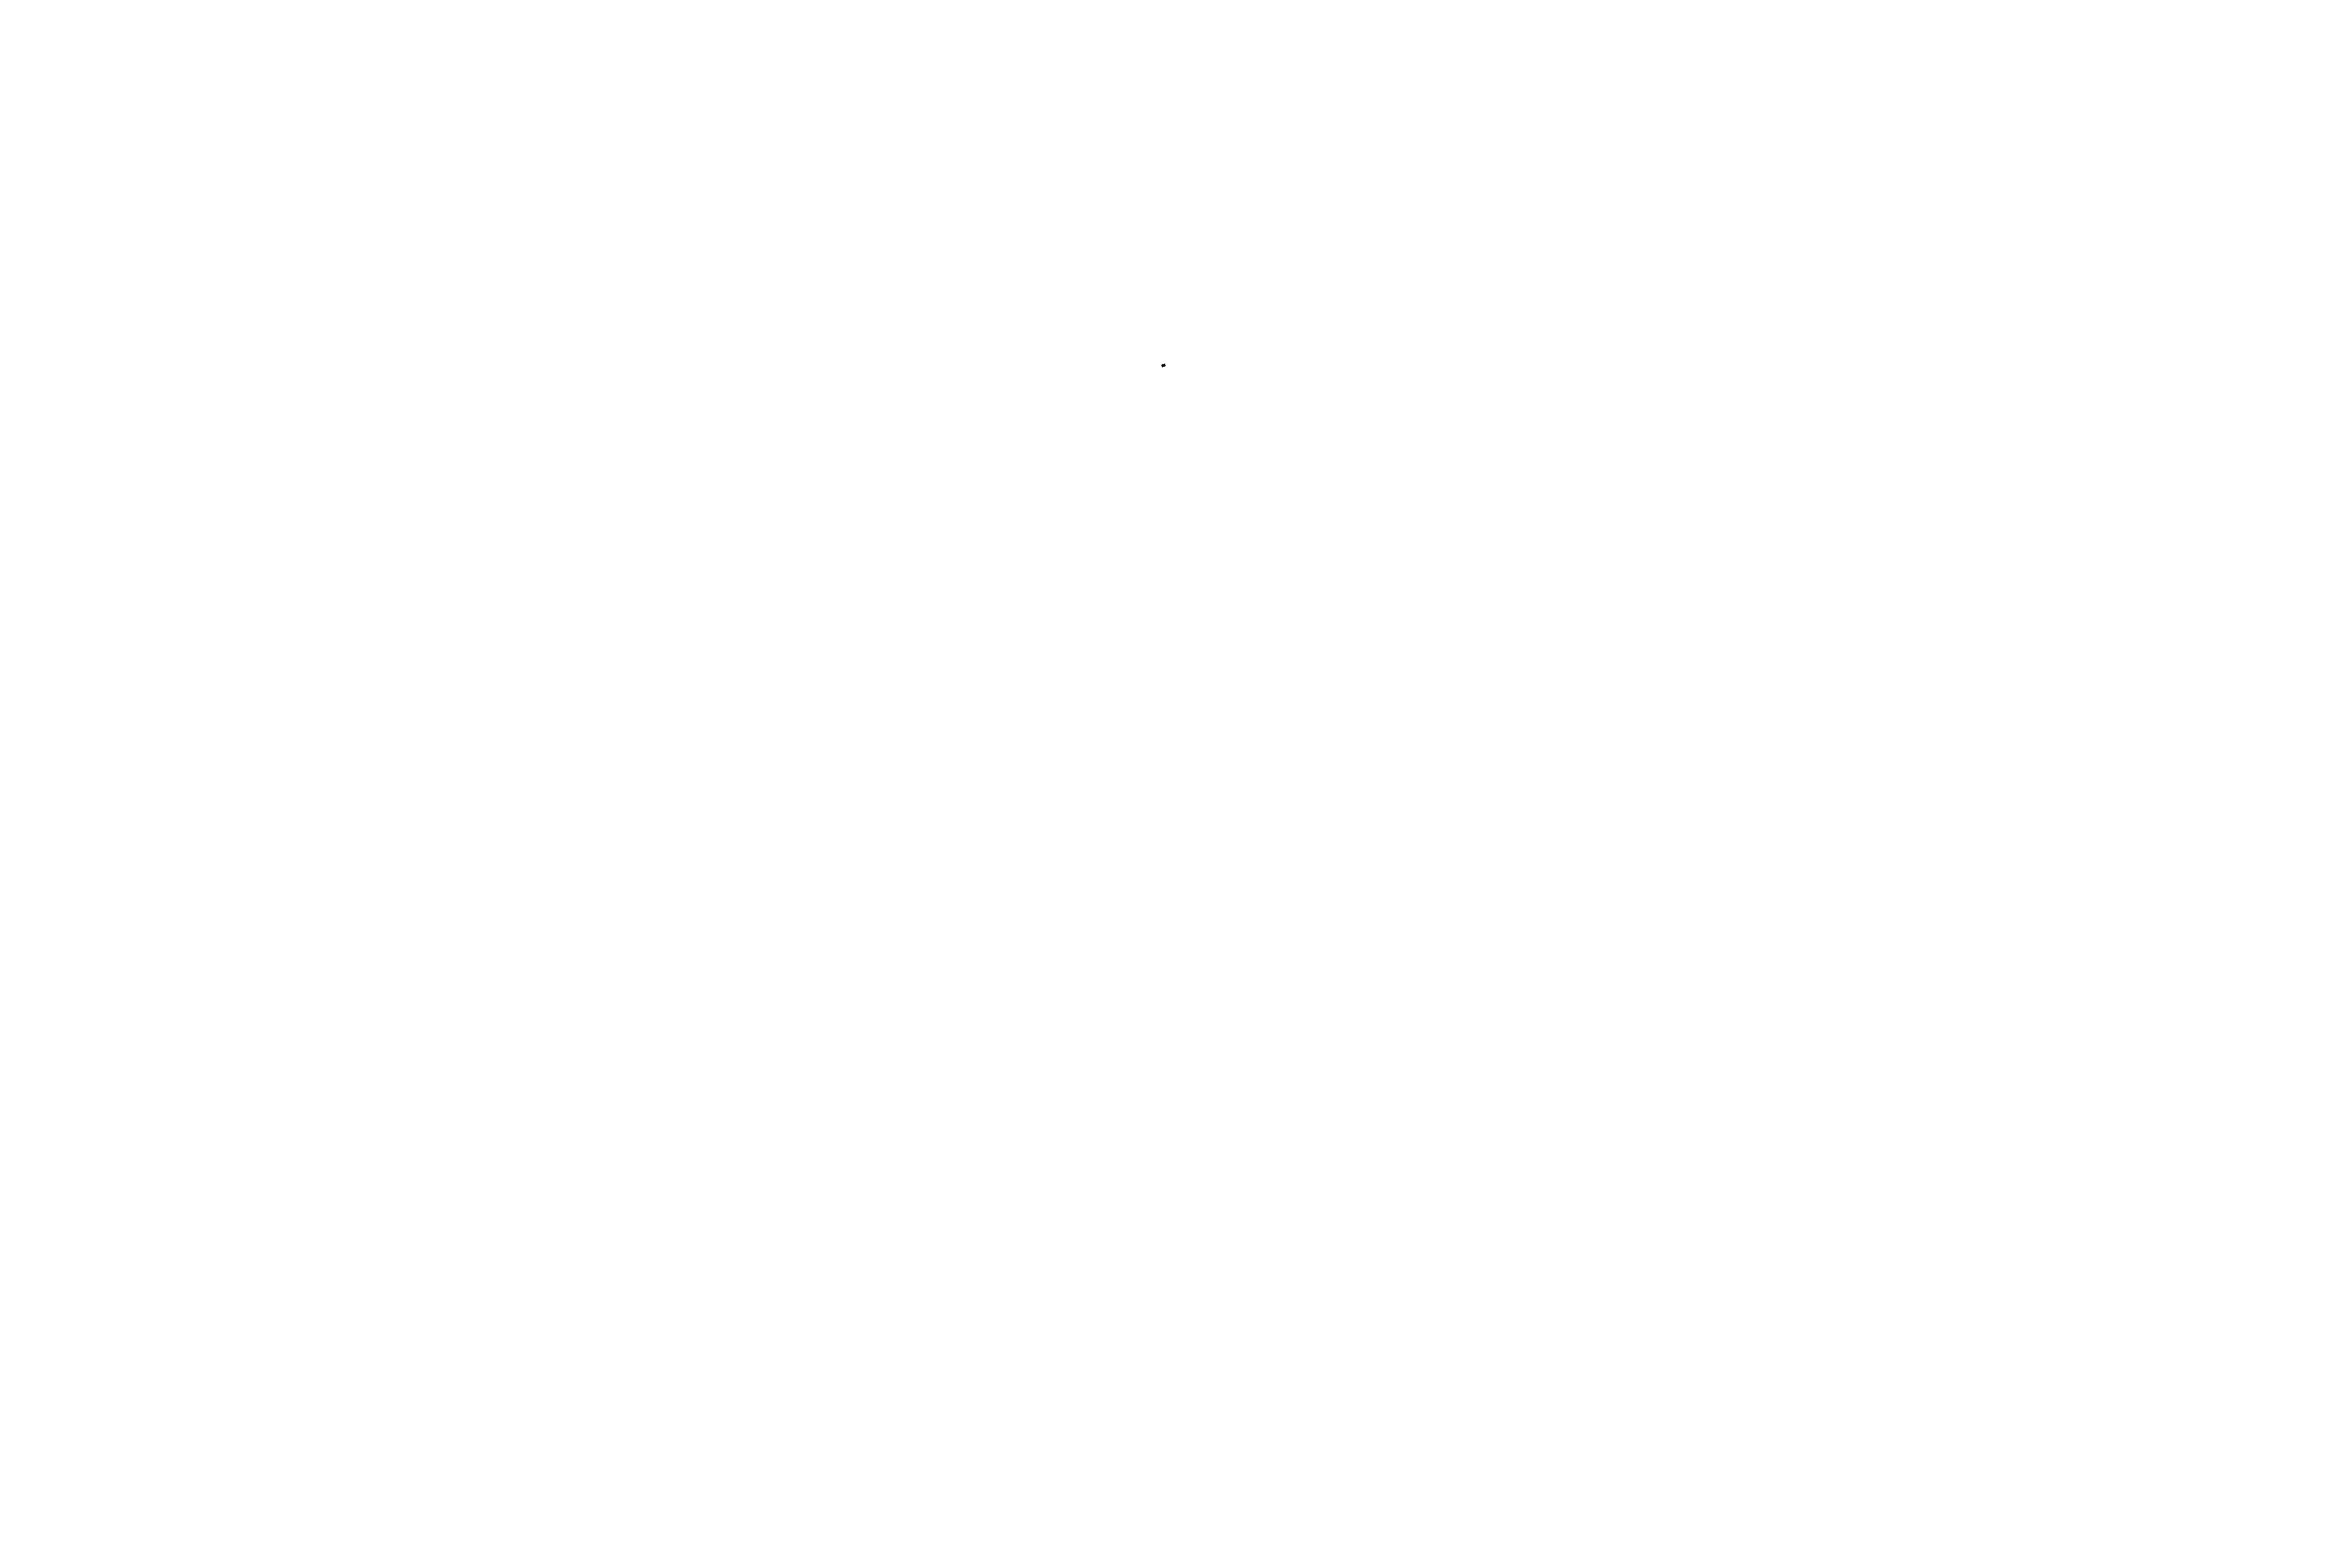 CRCLT_logo_white